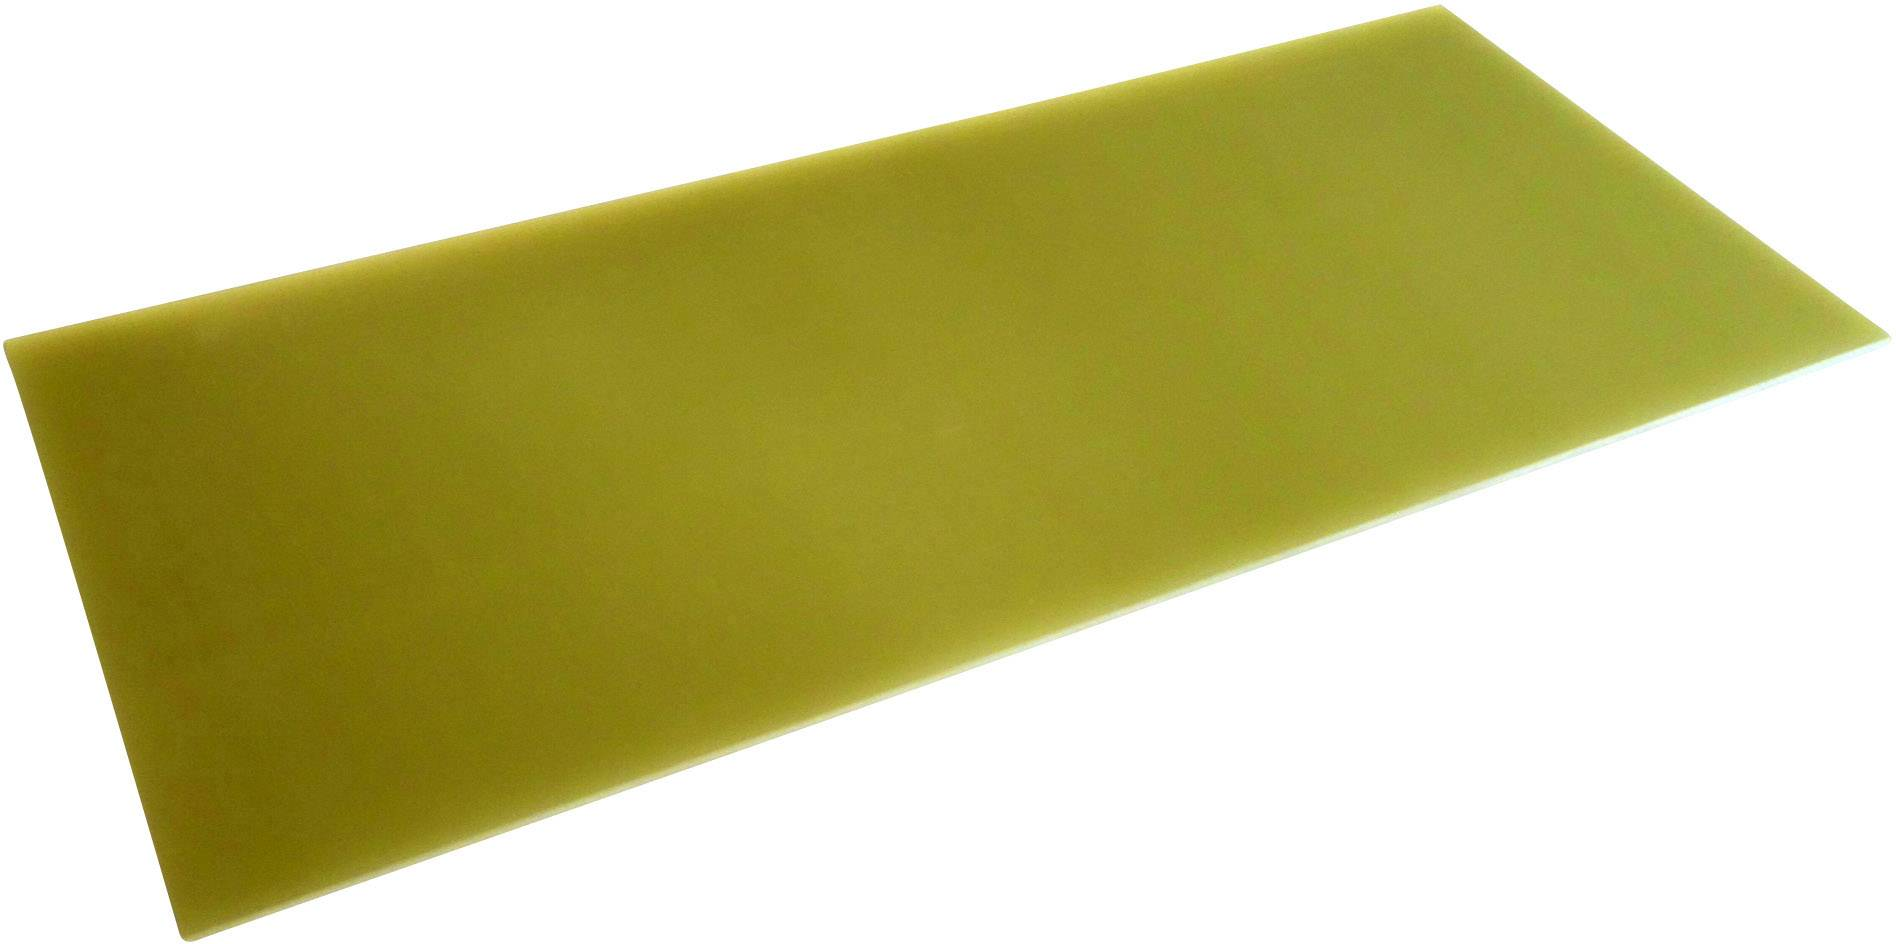 Epoxidová deska Carbotex 150 x 350 x 2,5 mm